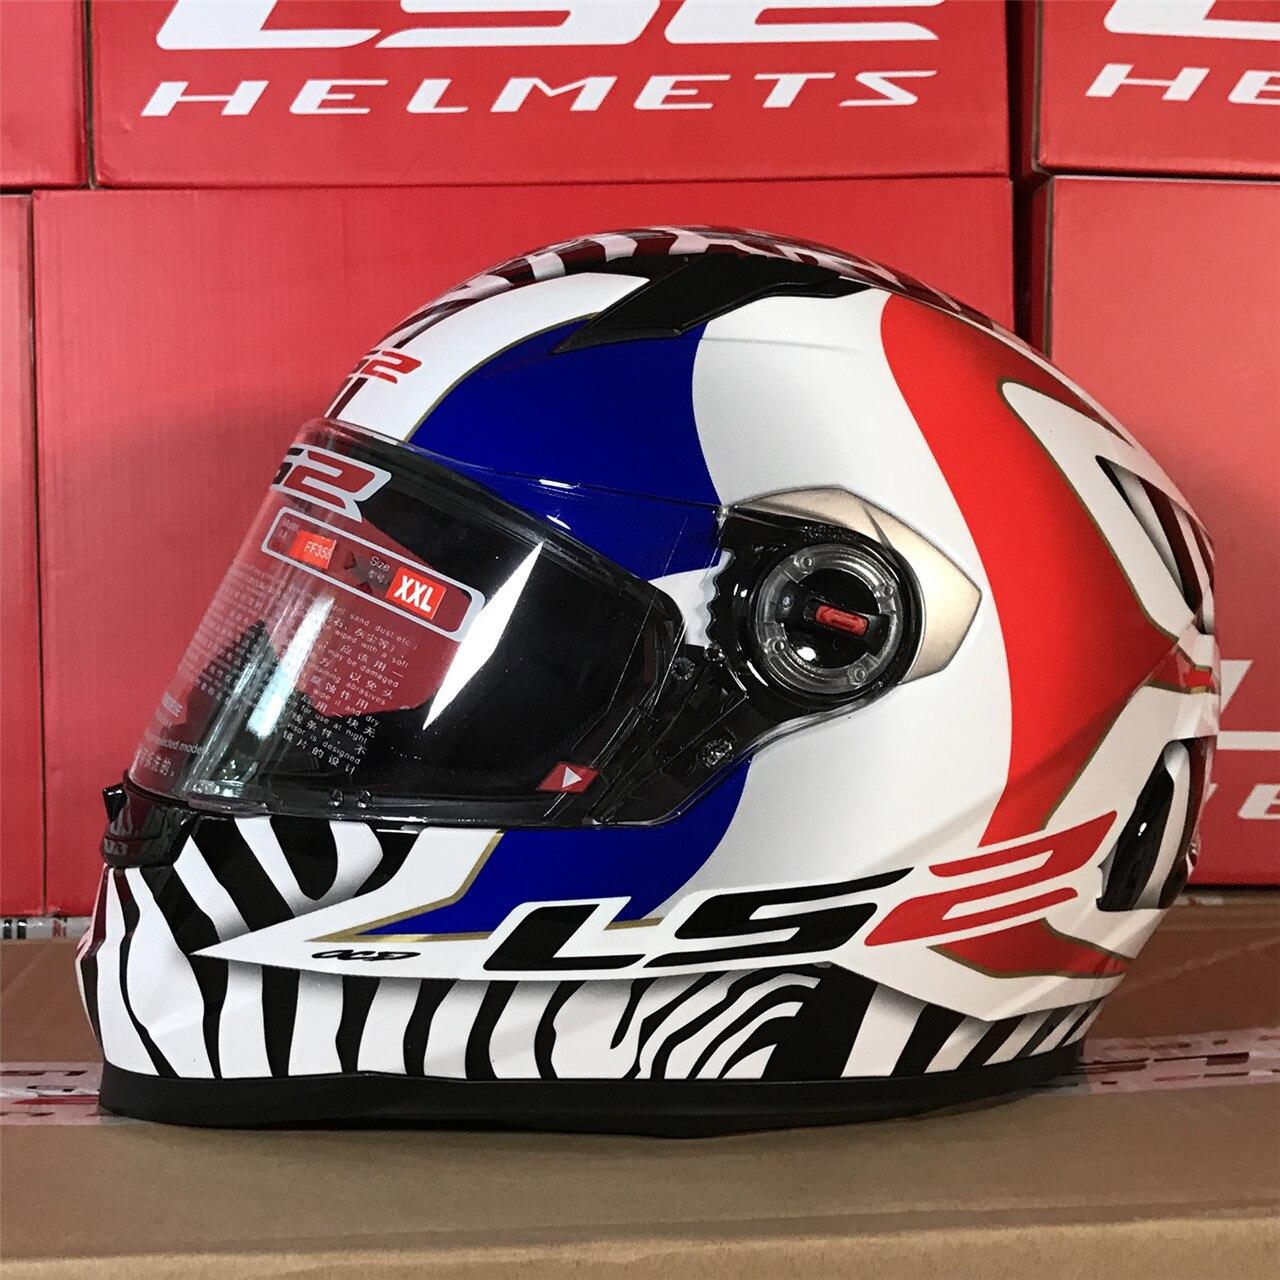 LS2 Classic Capacetes Moto Full Face Helmet for Motorcycle Racing Protective Gears original ls2 ff353 full face motorcycle helmet high quality abs moto casque ls2 rapid street racing helmets ece approved